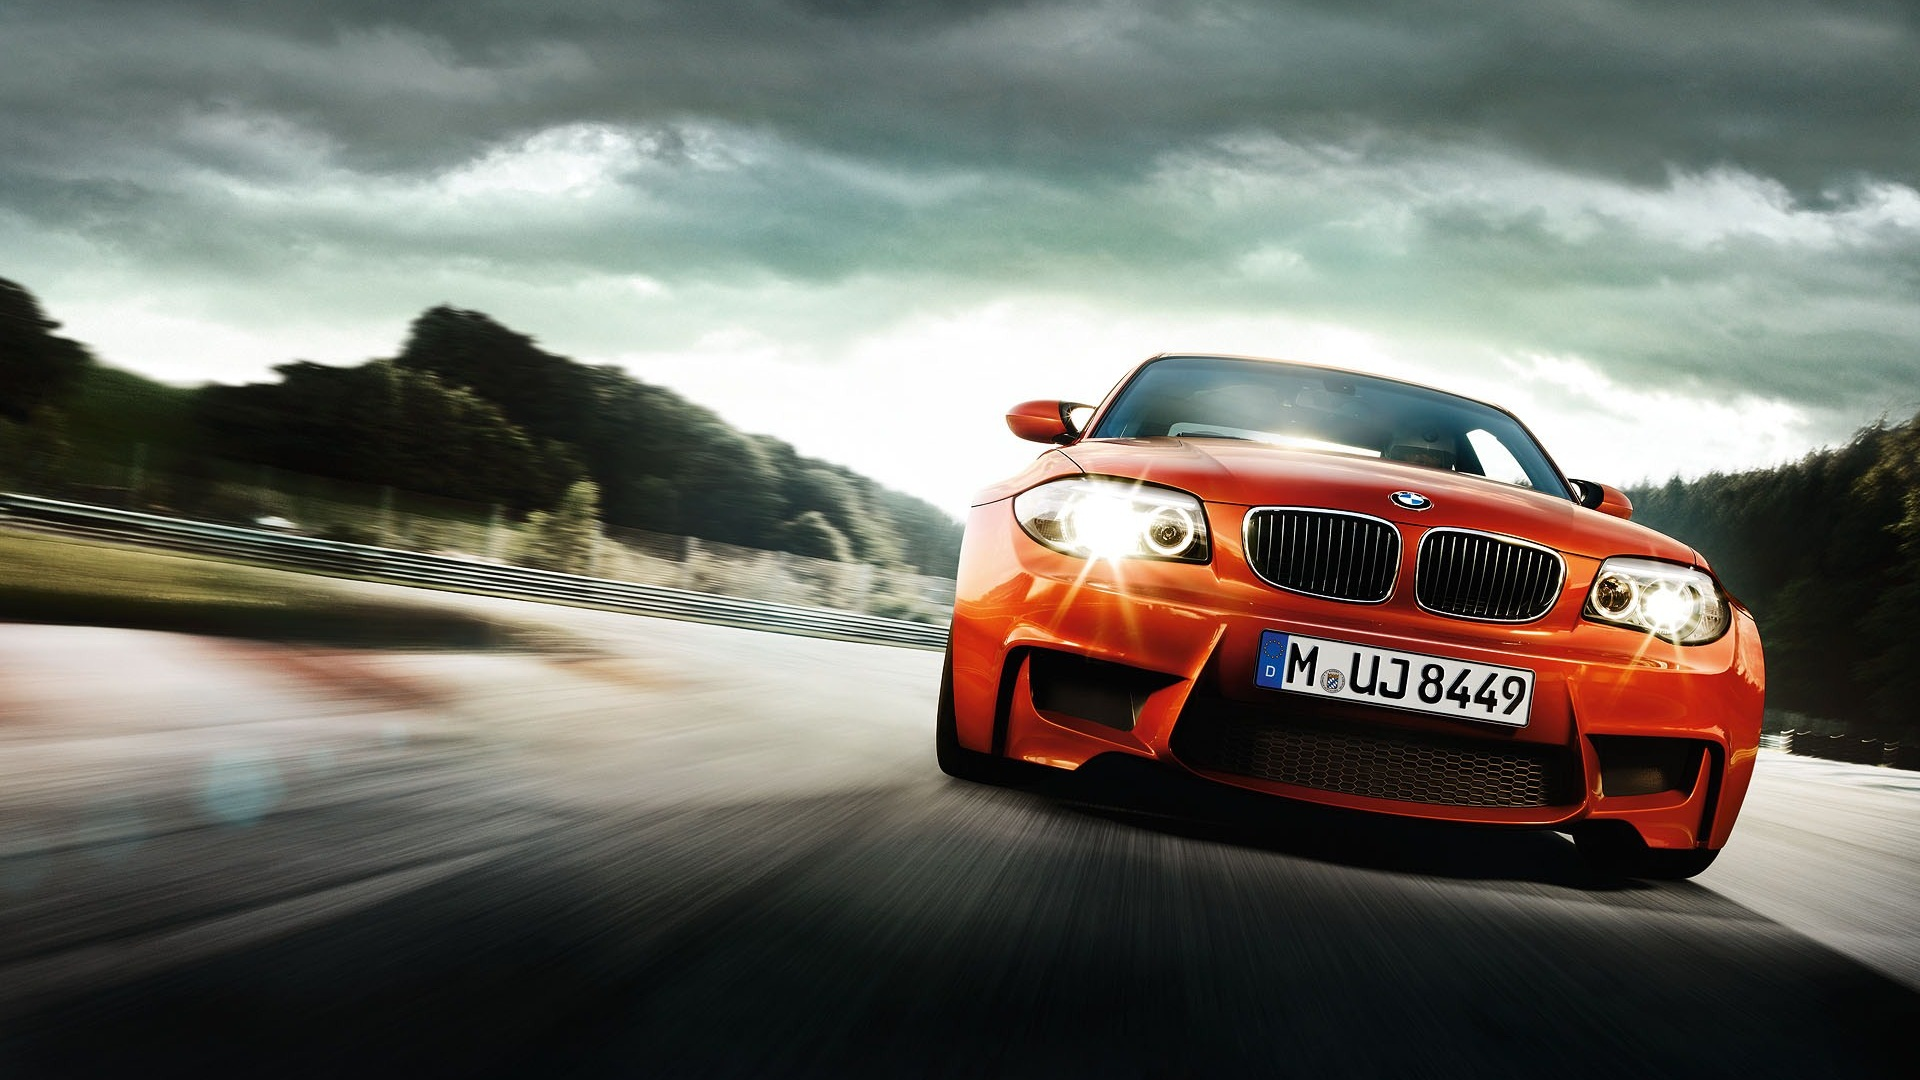 BMW перед оранжевая  № 843827 загрузить